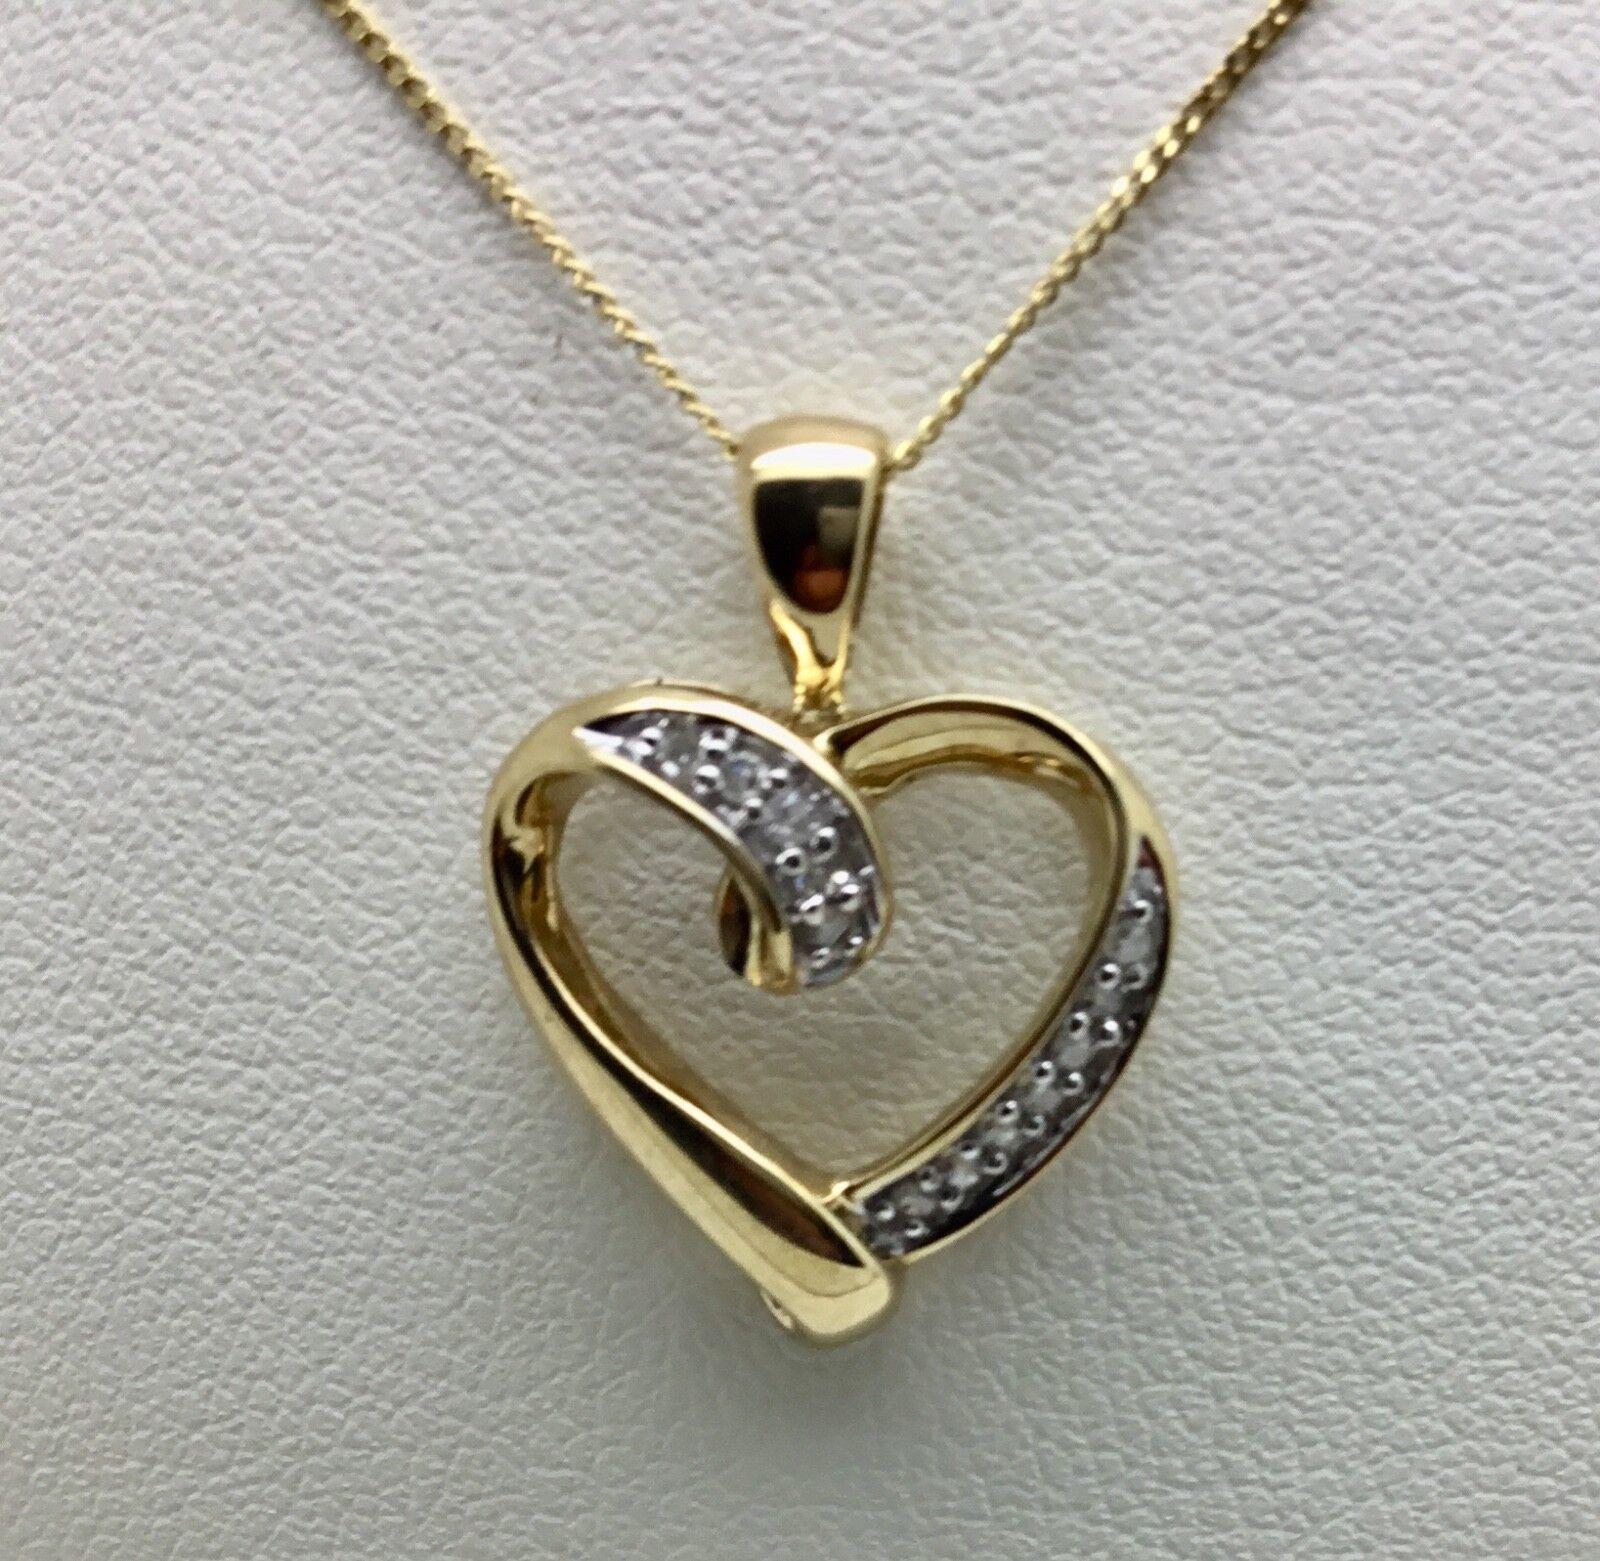 9ct gold heart pendant set with Diamonds